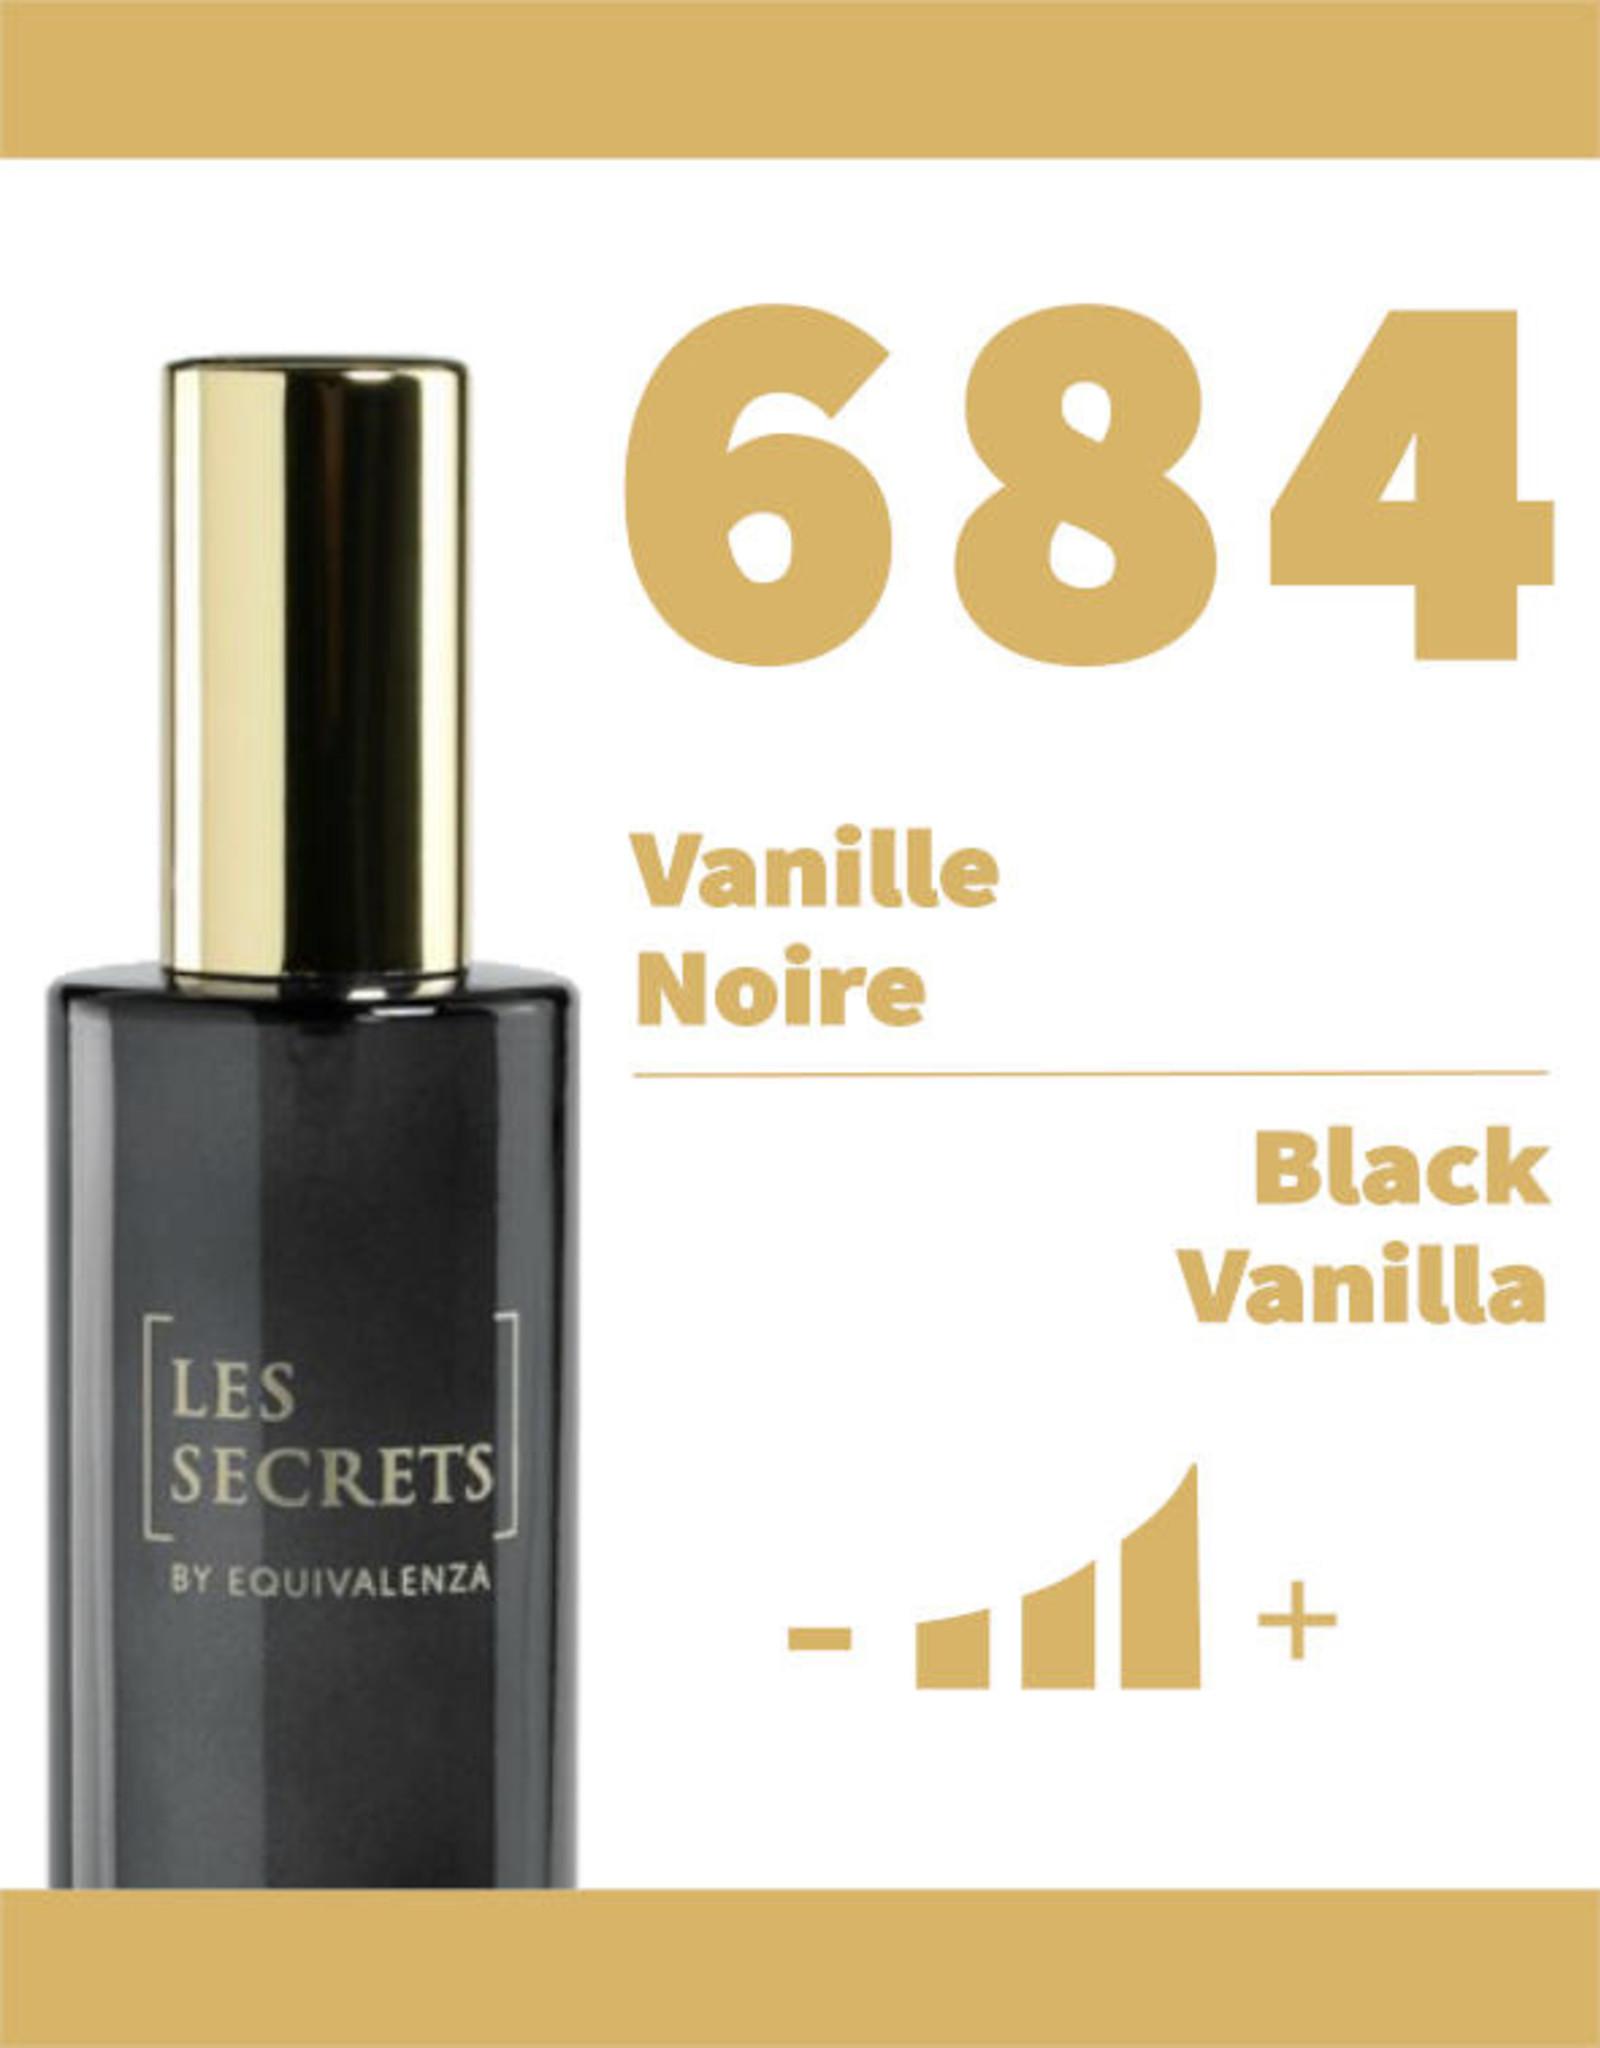 Equivalenza Vanille Noire 684